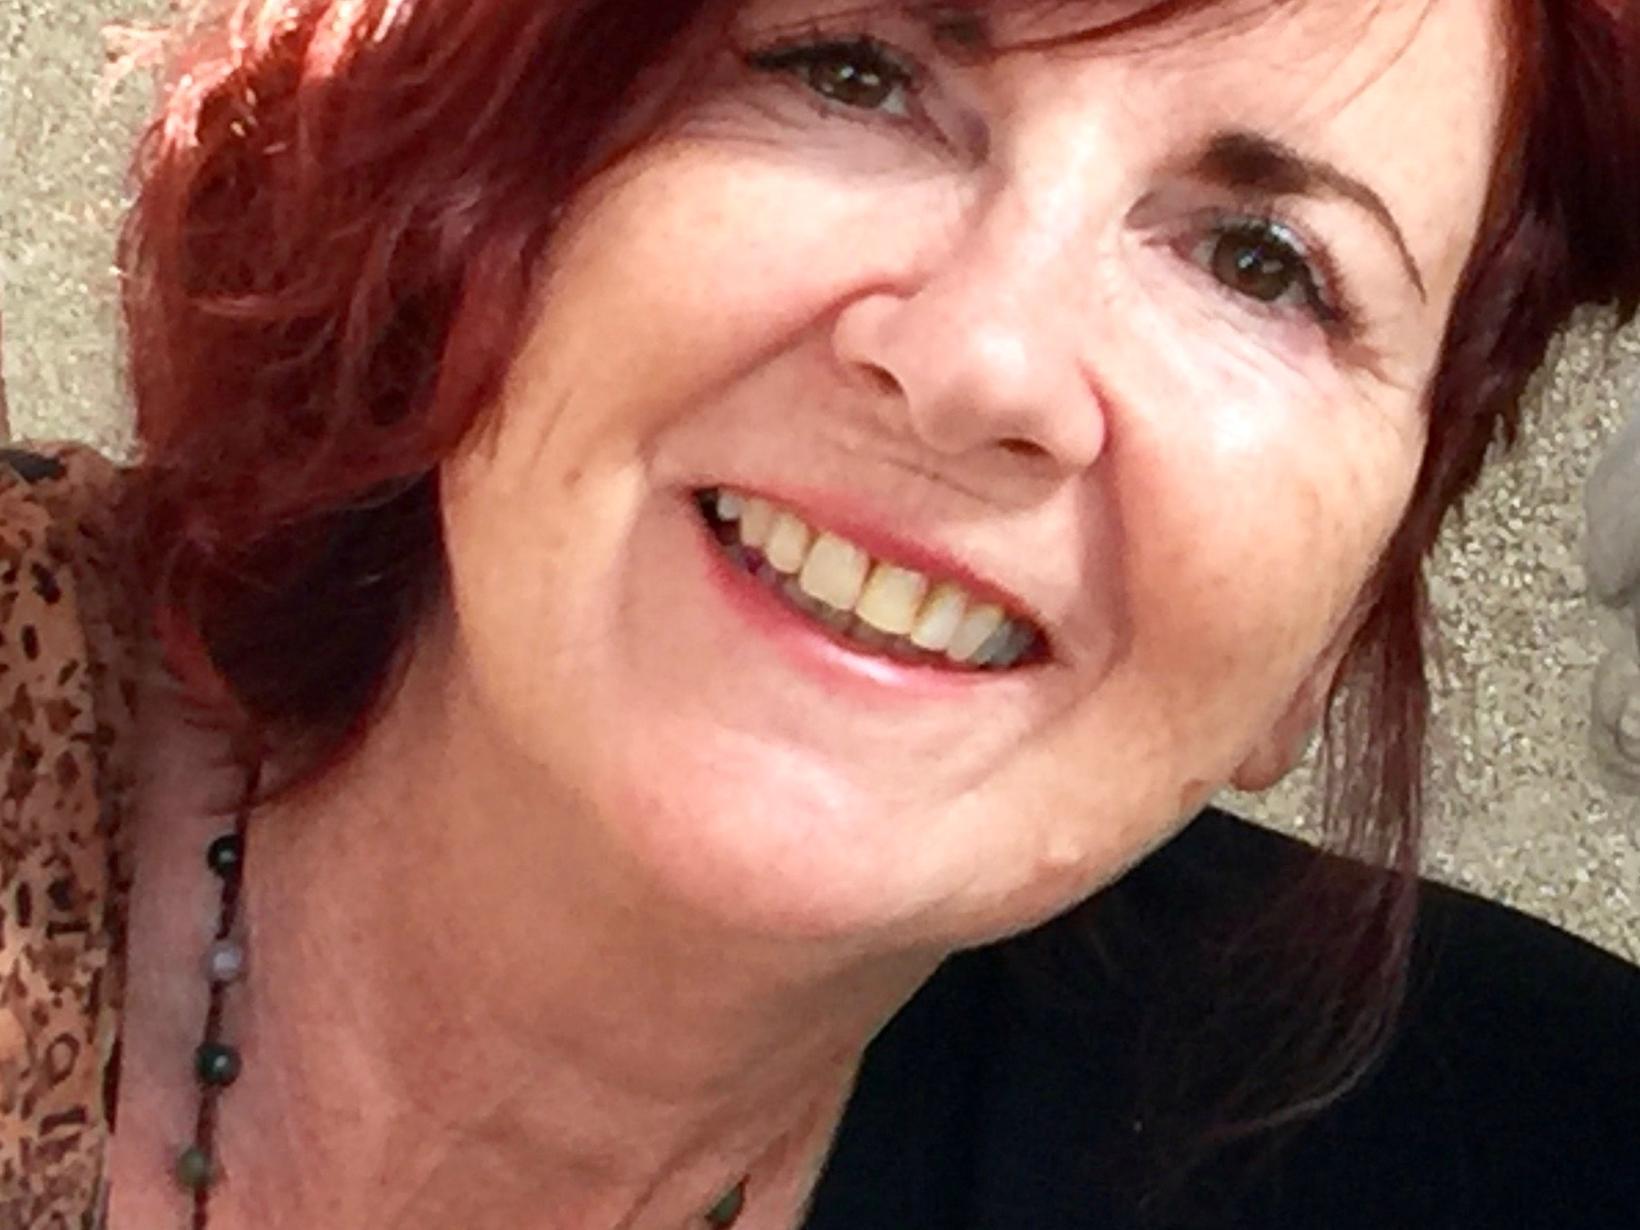 Dolores from Brisbane, Queensland, Australia